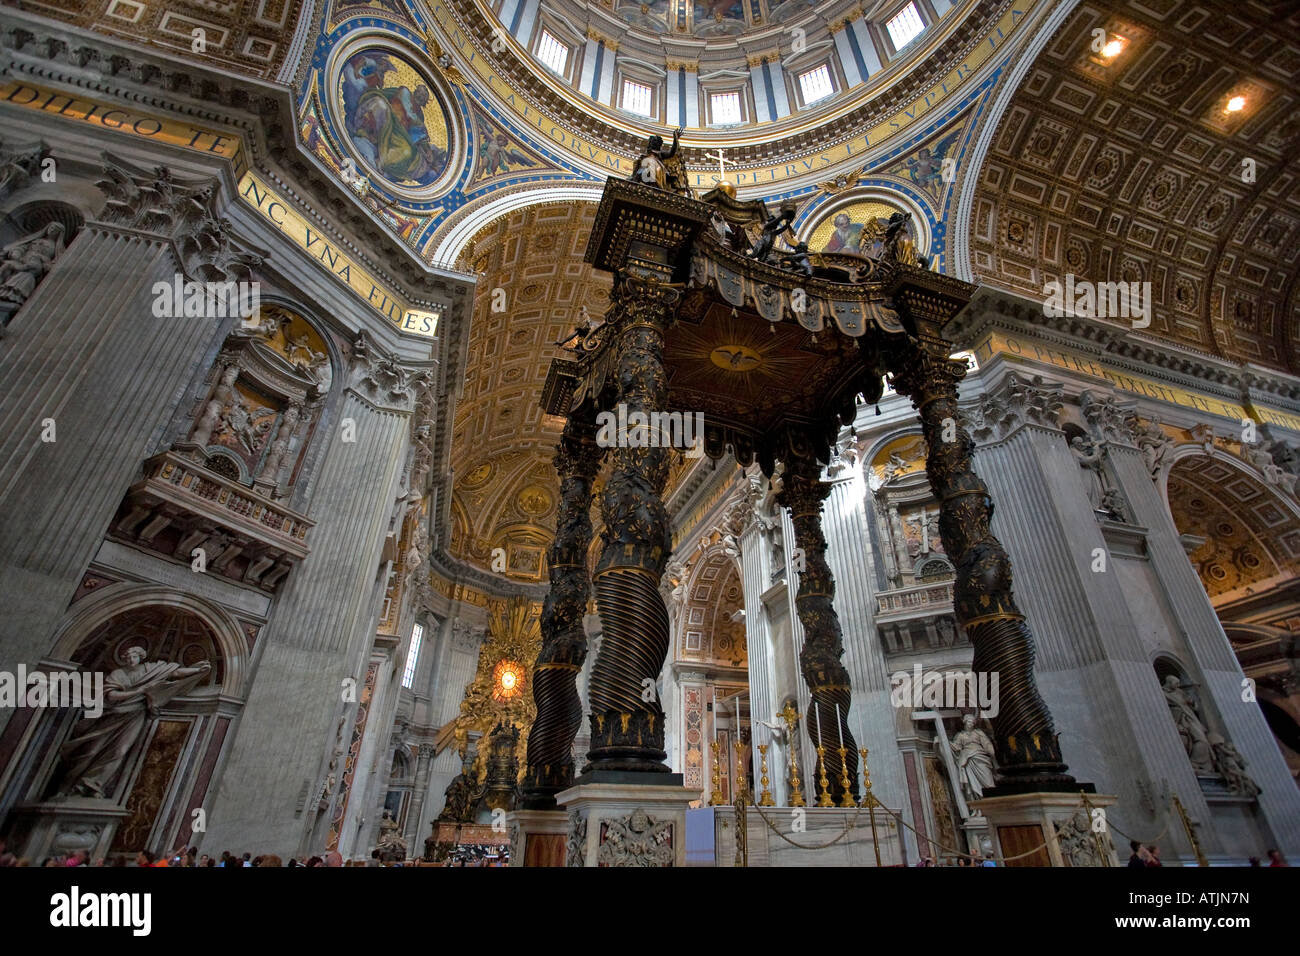 Detail of Bernini s Baroque baldachin St Peter s Basilica Rome Italy - Stock Image